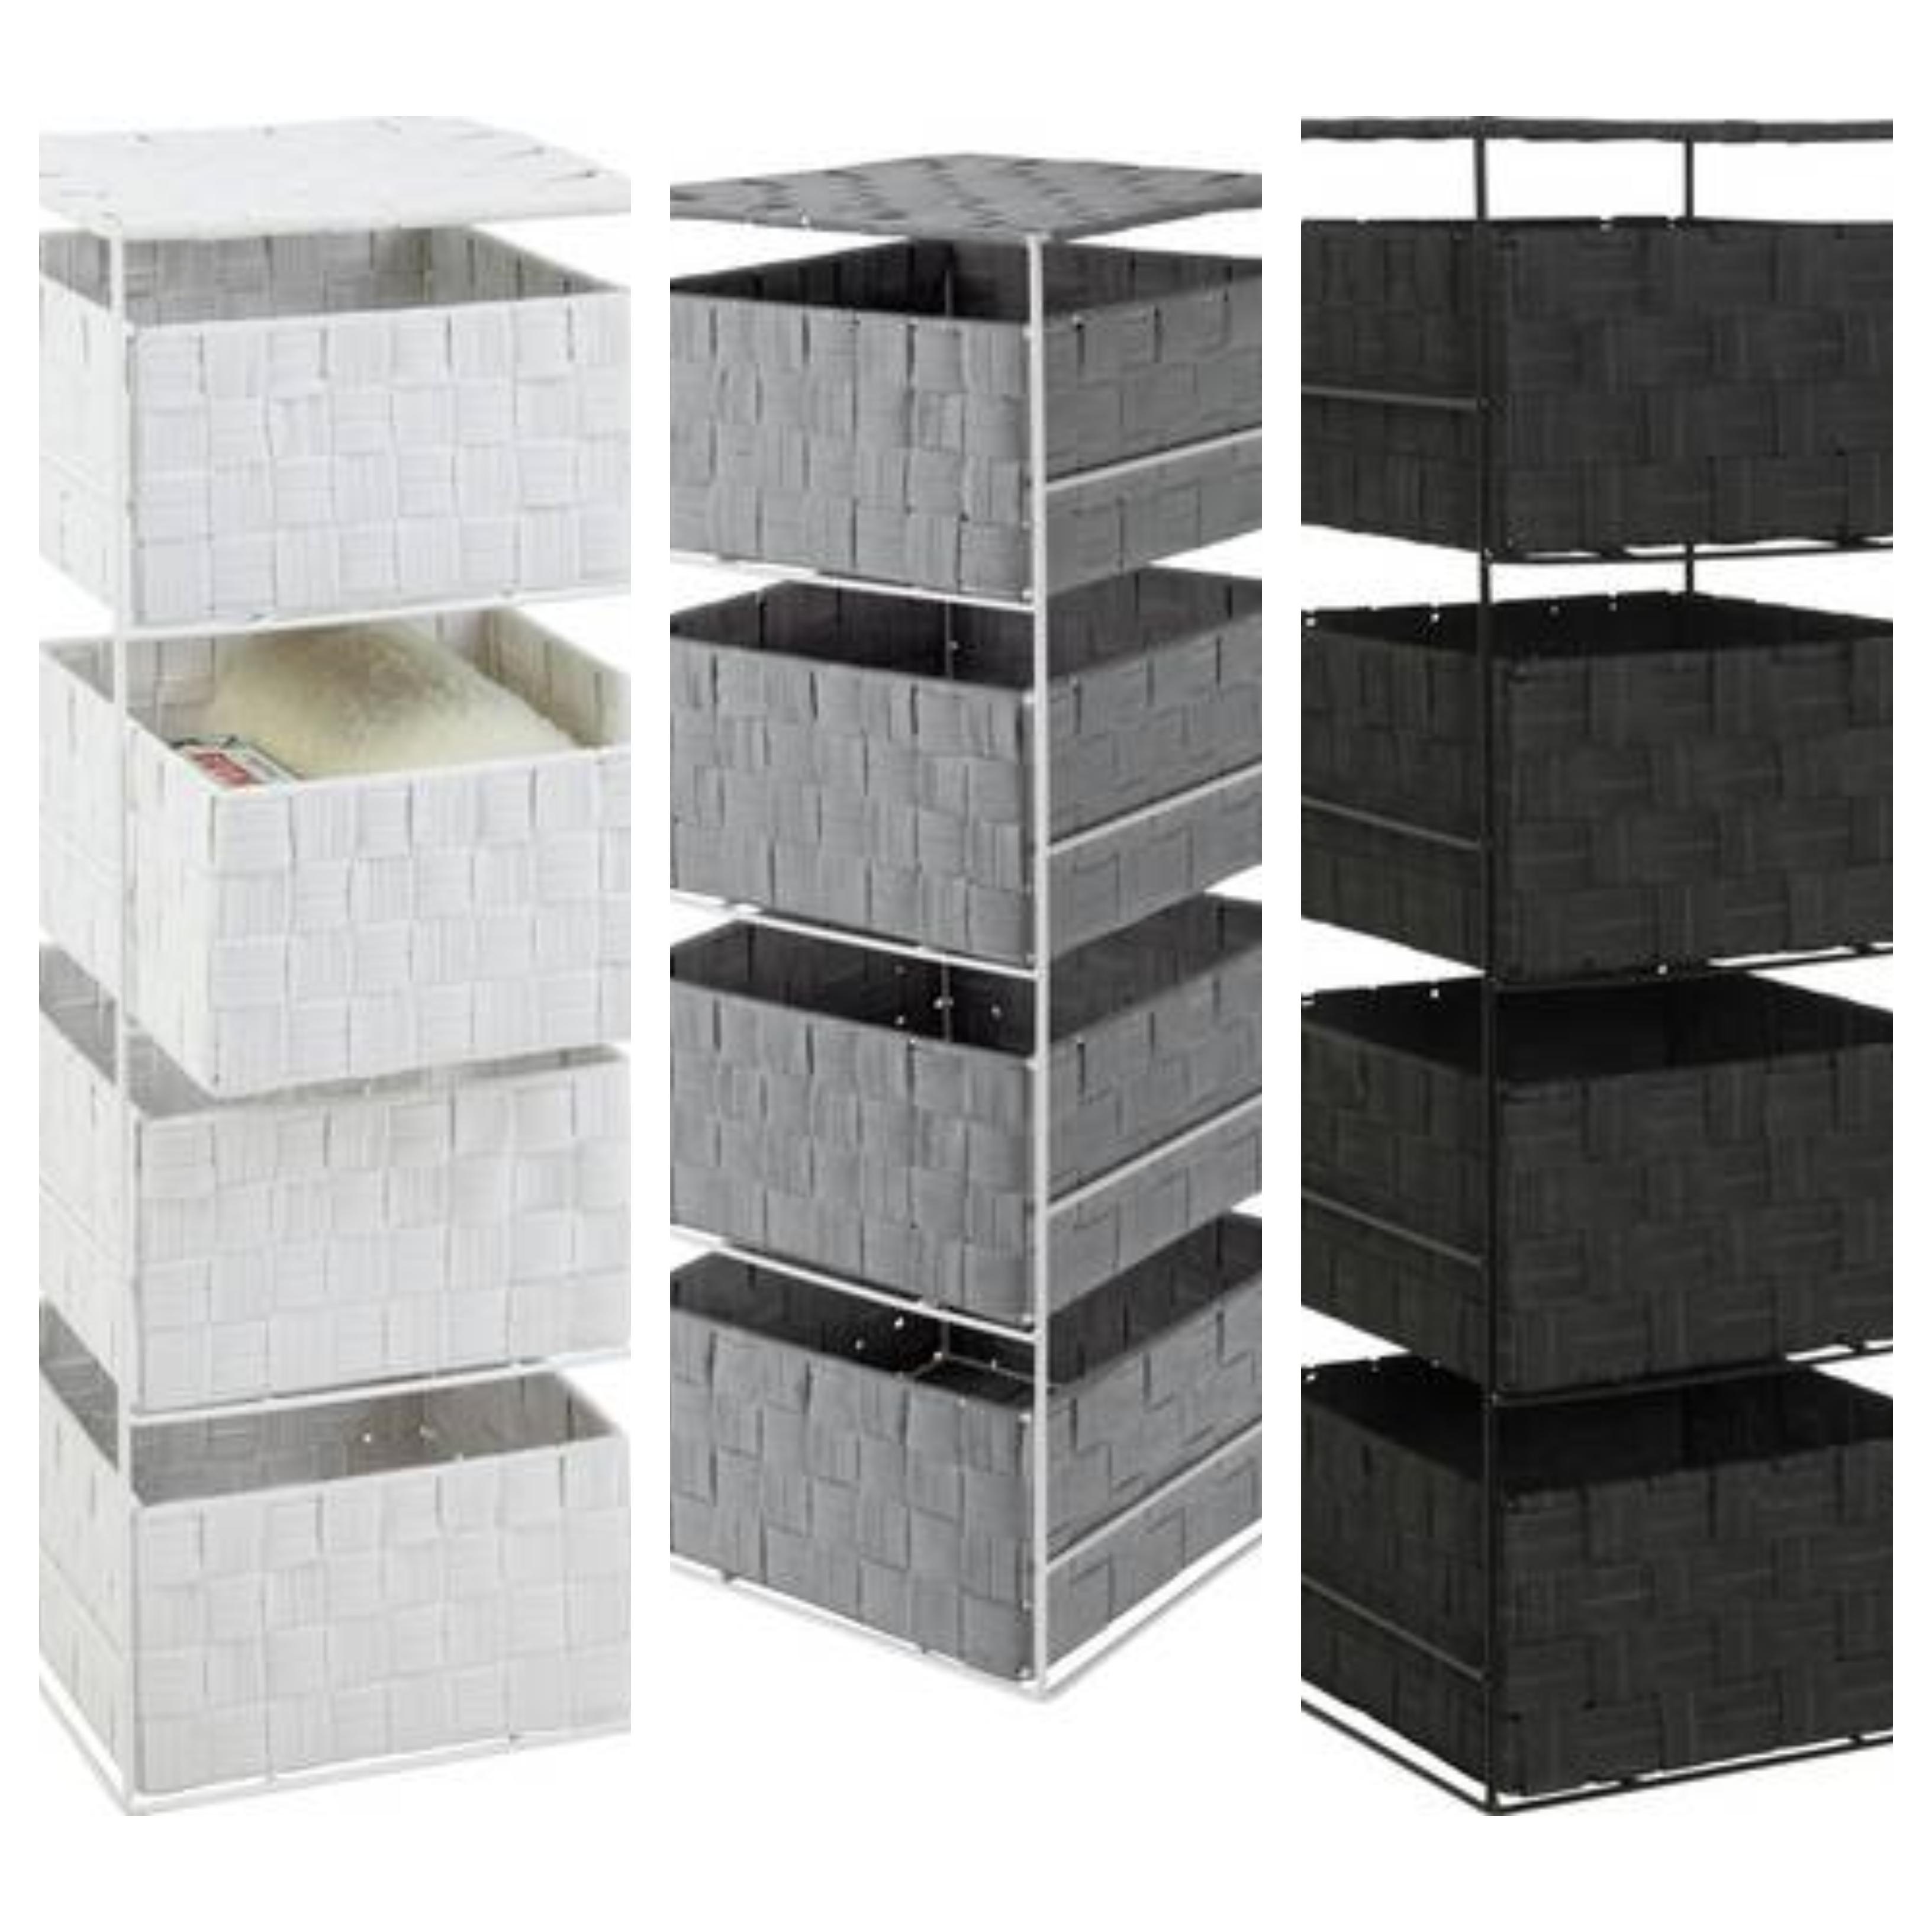 4 Drawer Storage Unit - White, Grey or Black - £15 @ Argos - Free Click & Collect